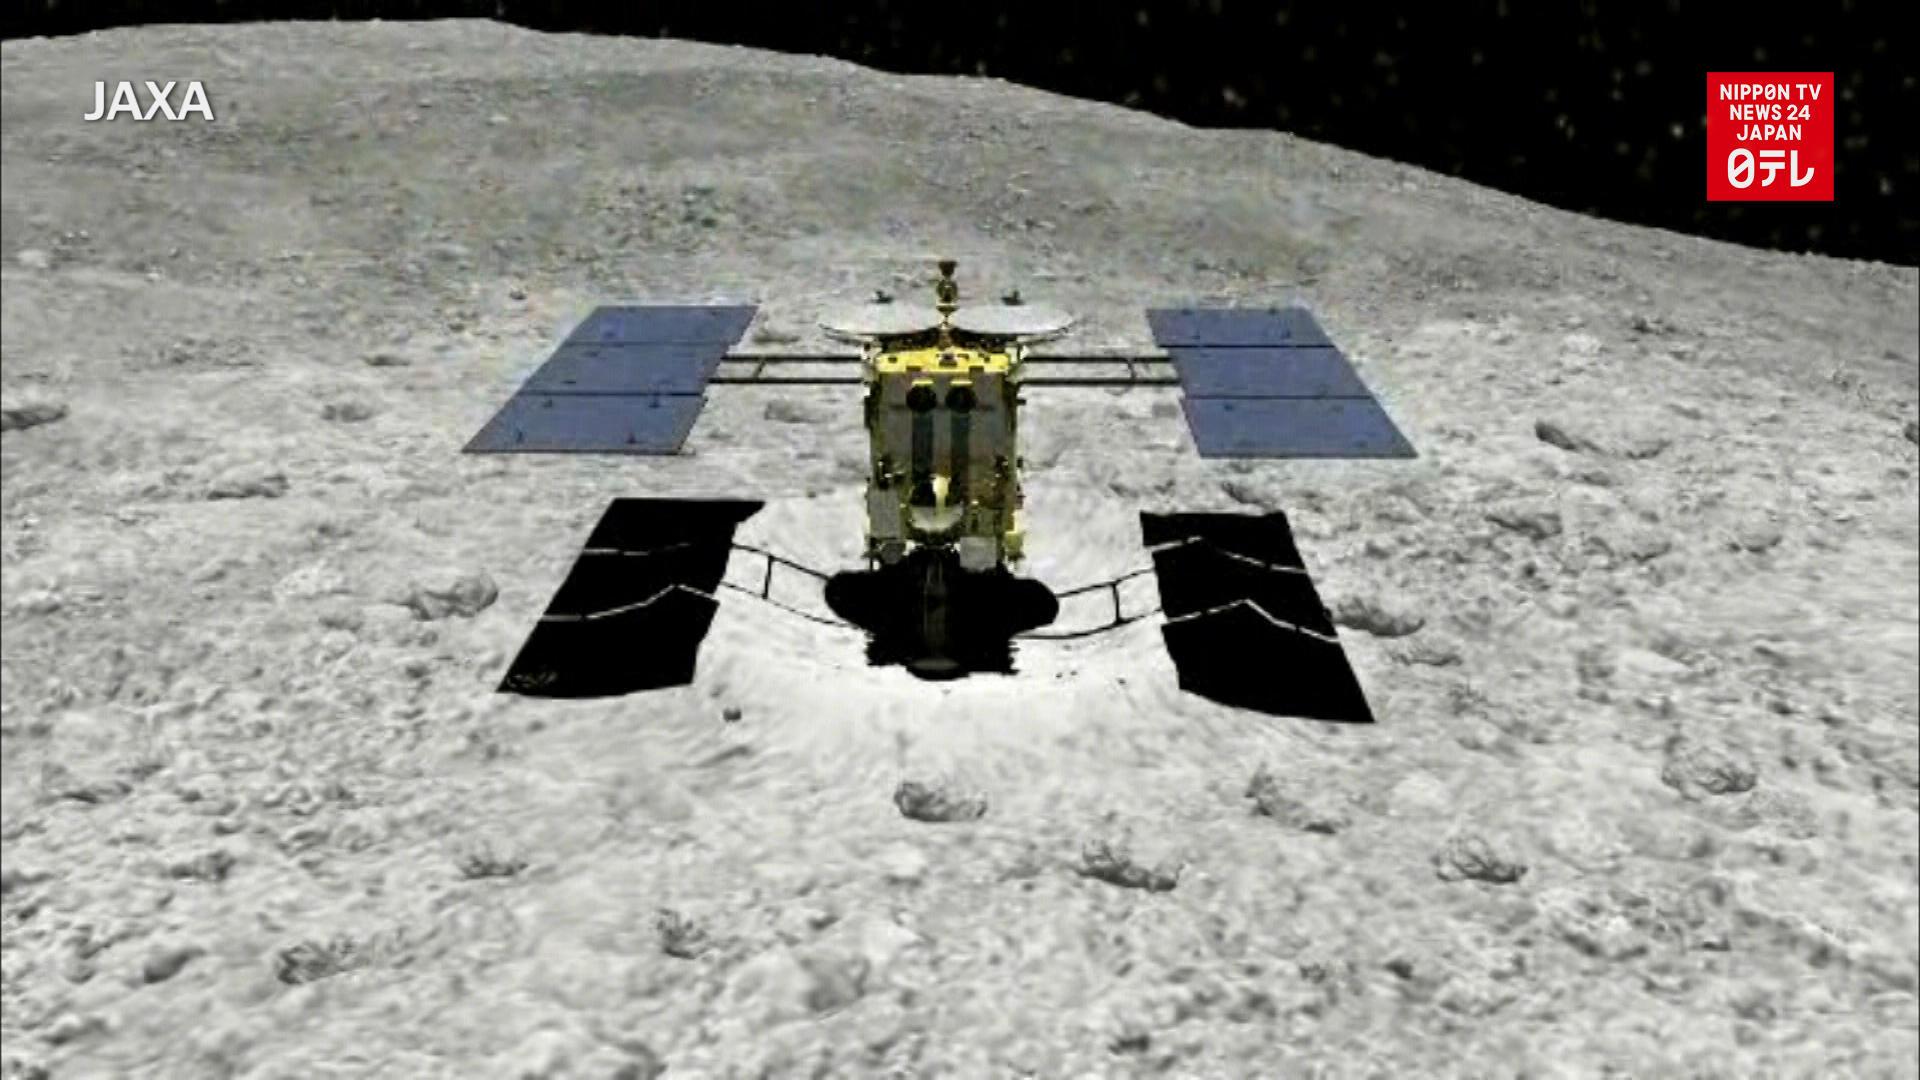 Japan's asteroid explorer to return in December